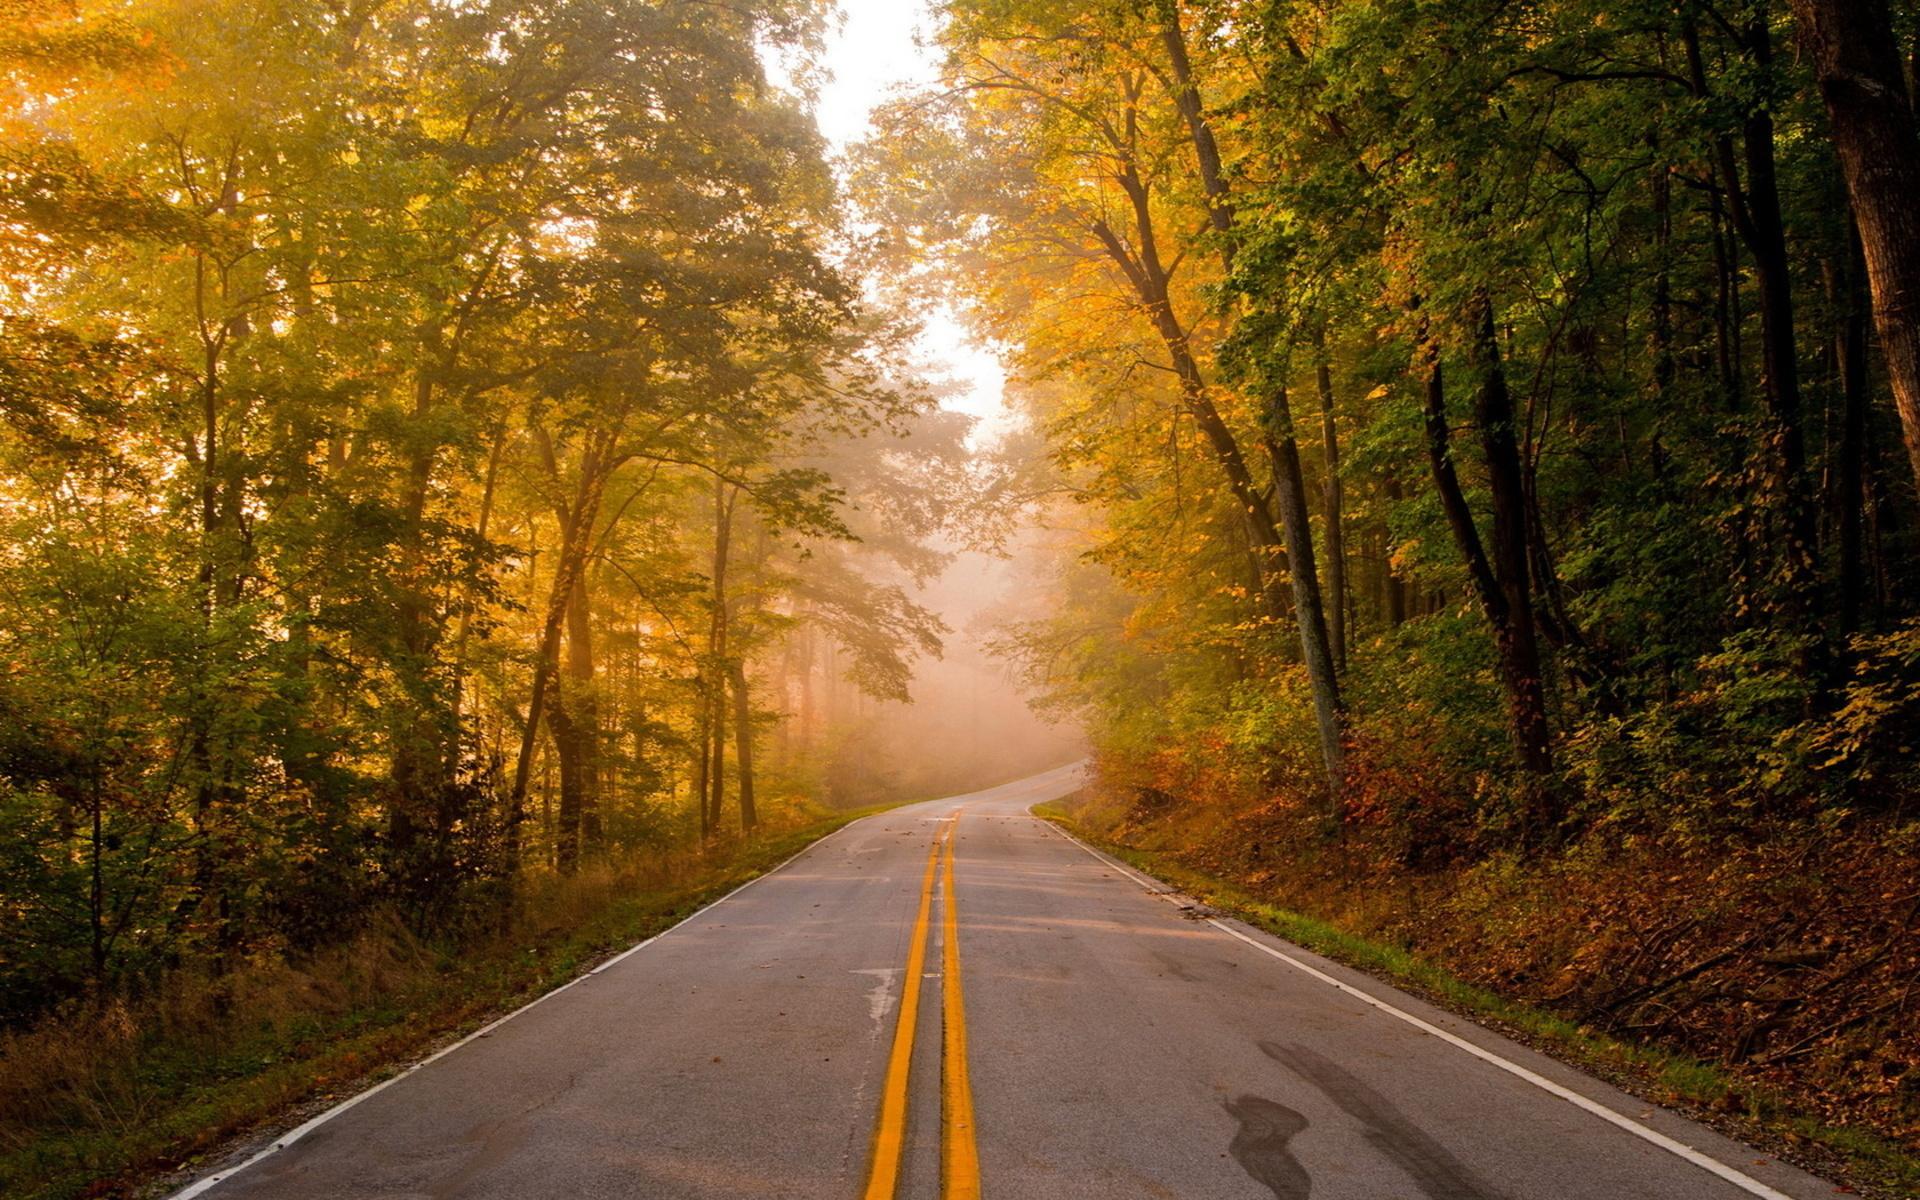 осень, дорога, разметка